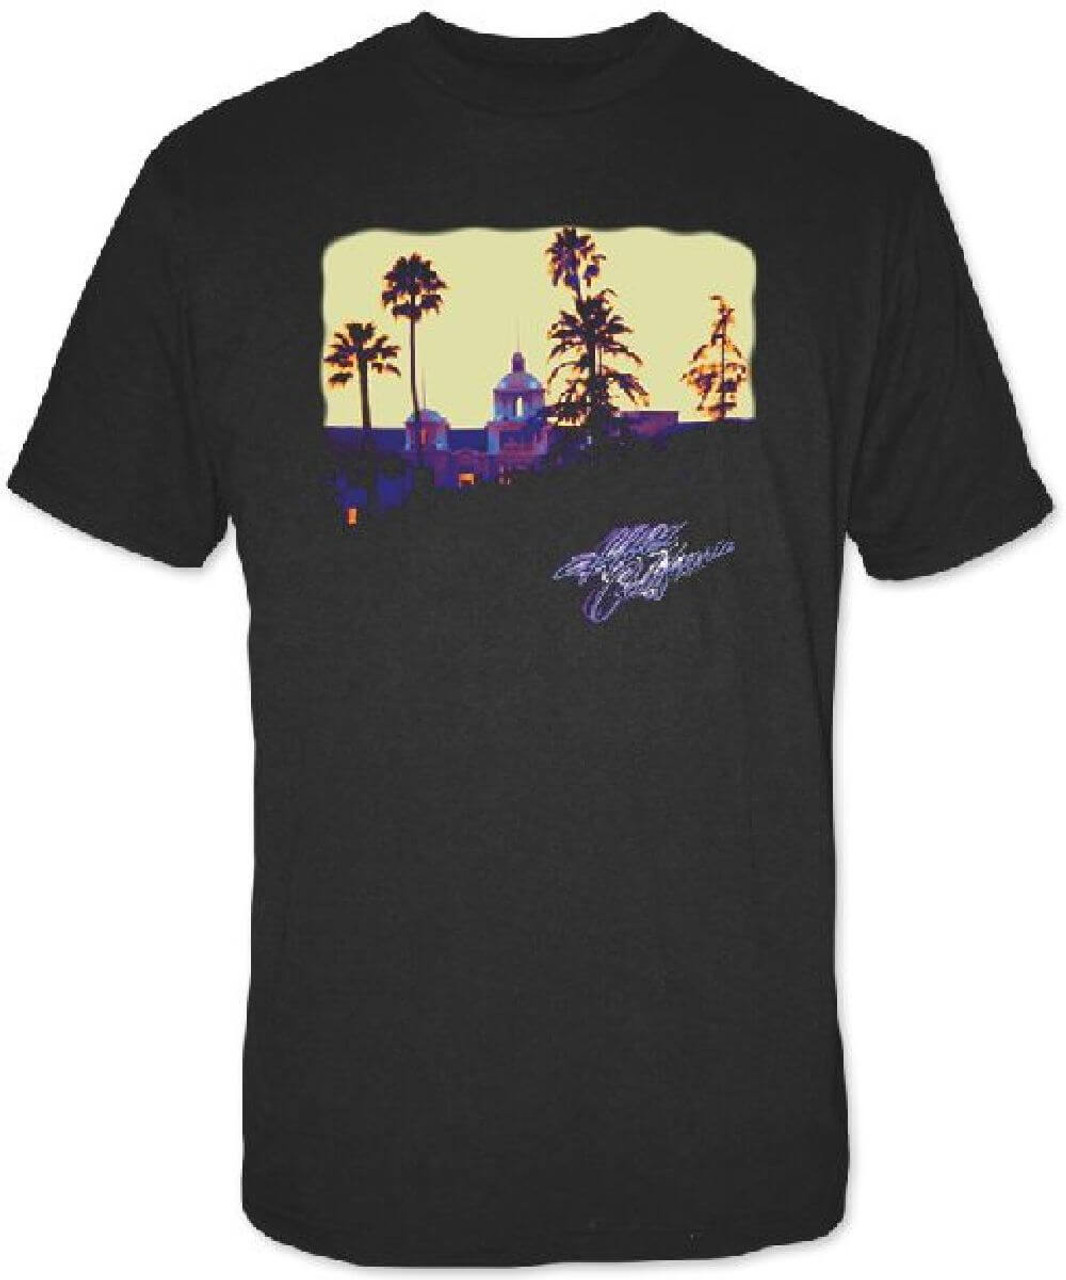 Eagles Band Hotel California Shirt